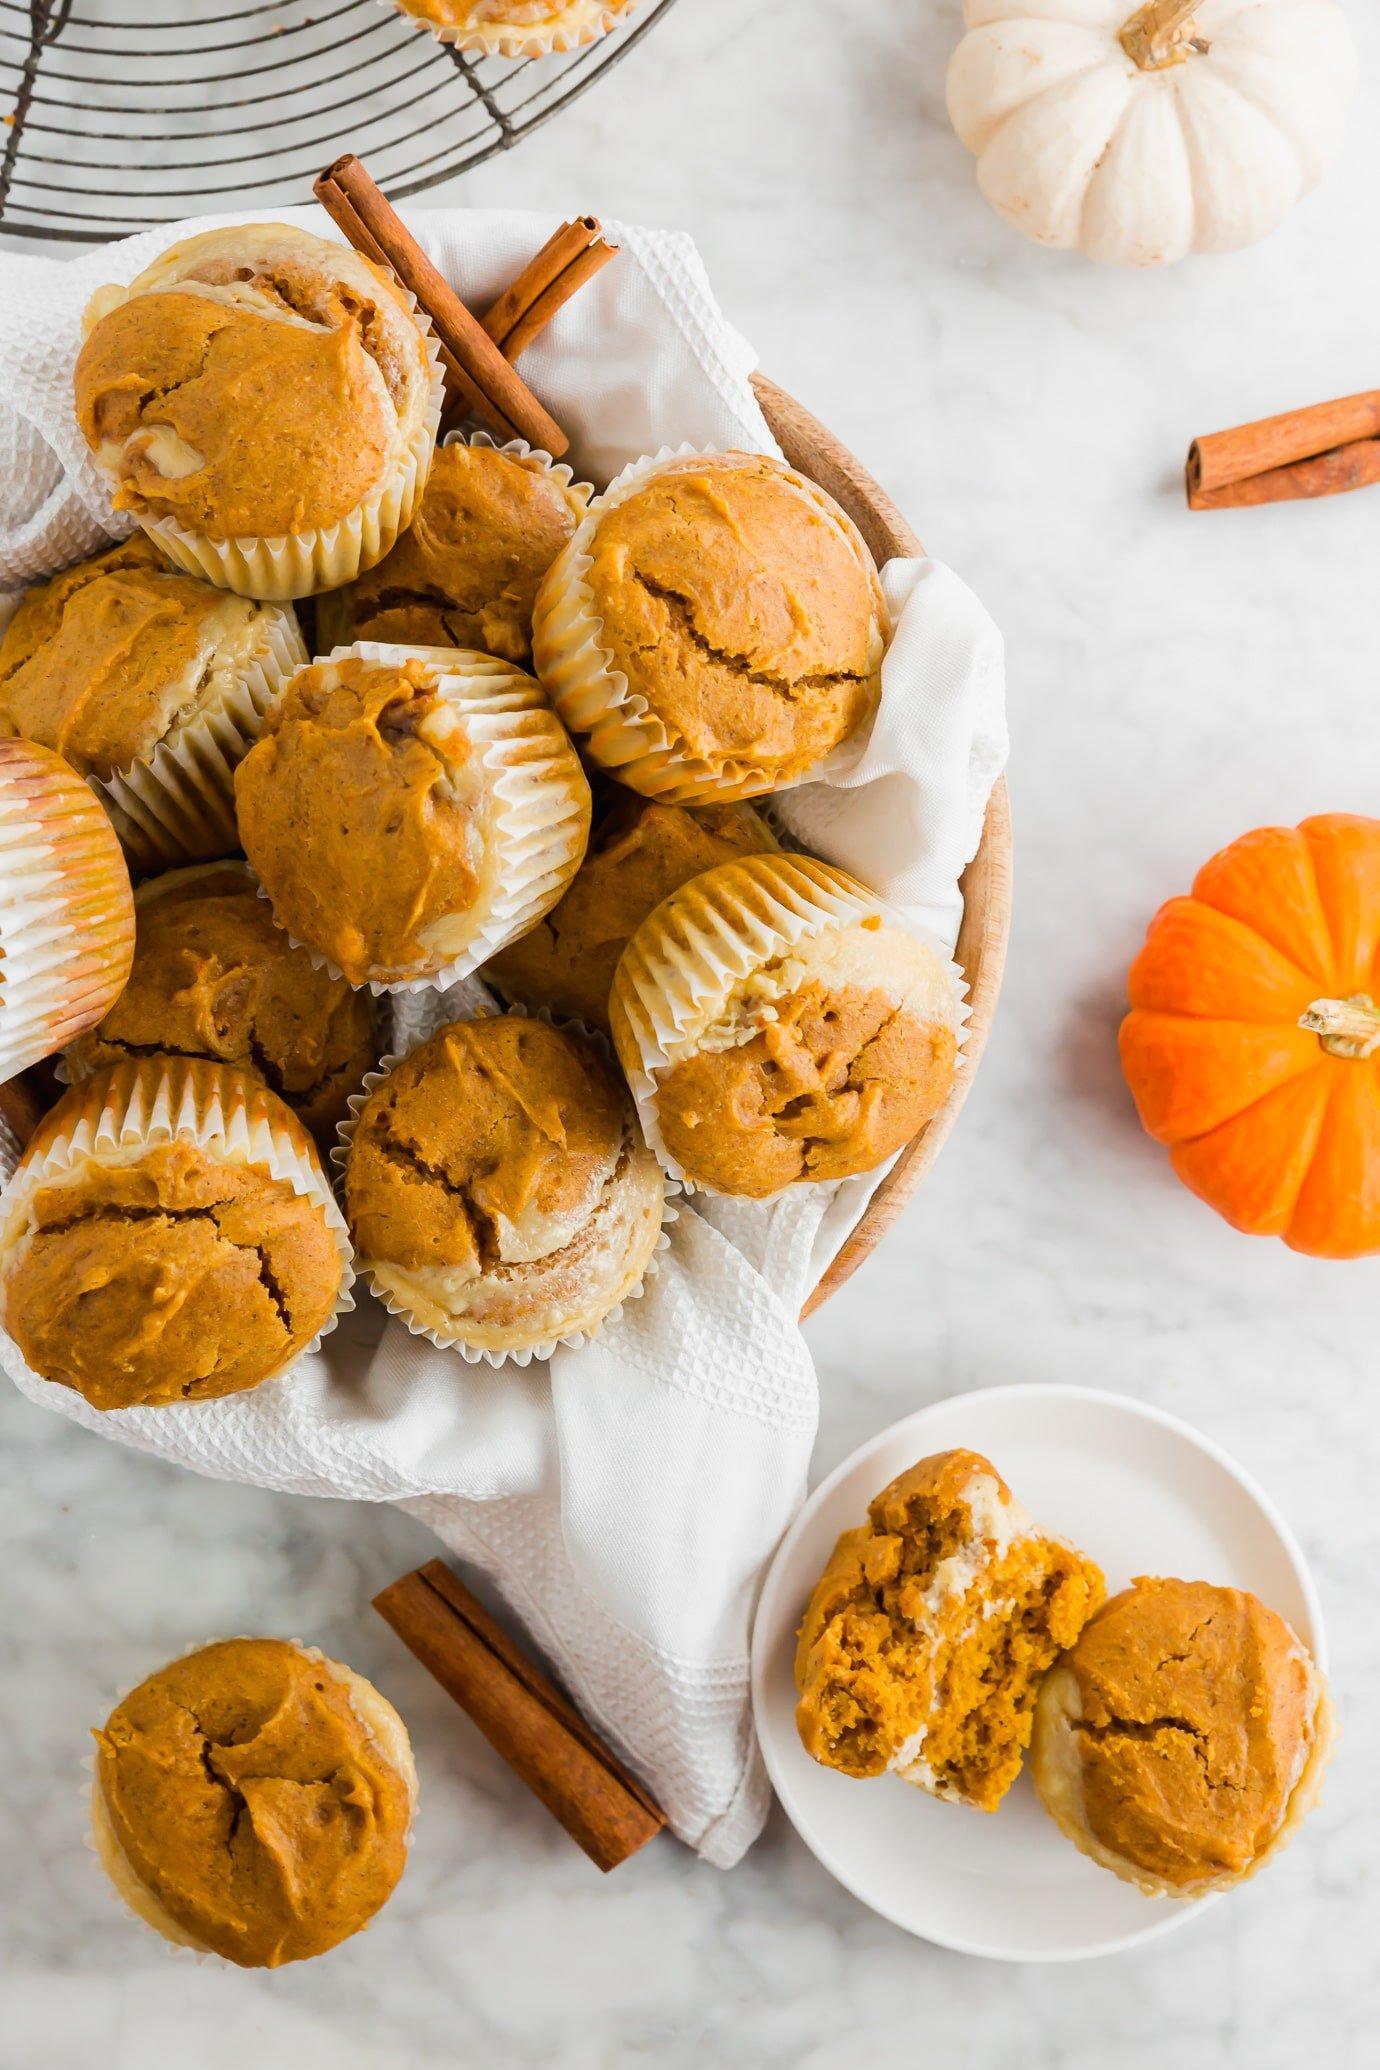 A basket of gluten-free pumpkin cream cheese muffins with fresh pumpkins and cinnamon sticks.